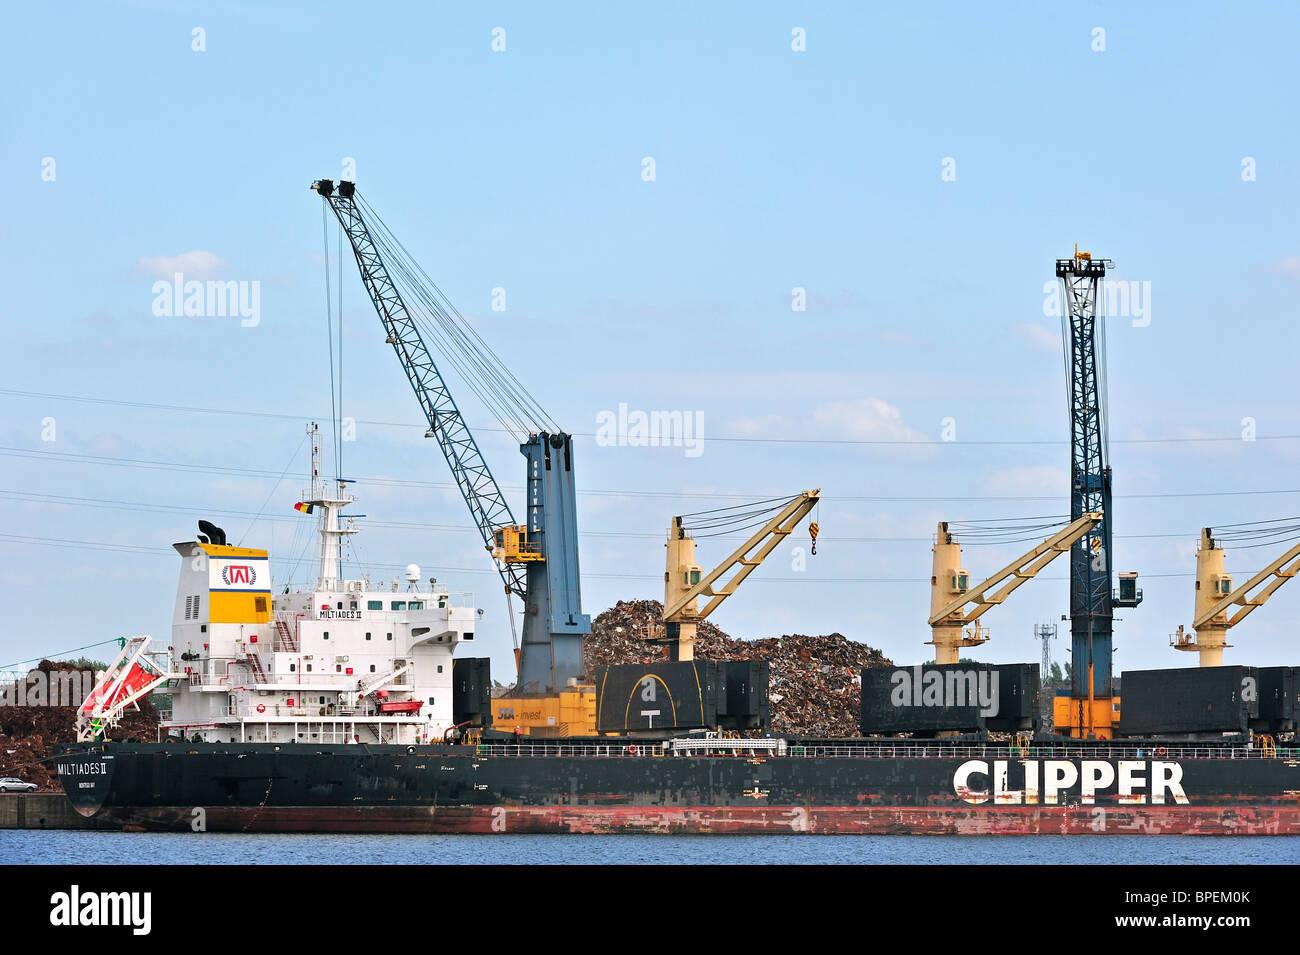 Dock crane loading bulk carrier with recycled scrap metal at Ghent seaport, Belgium - Stock Image